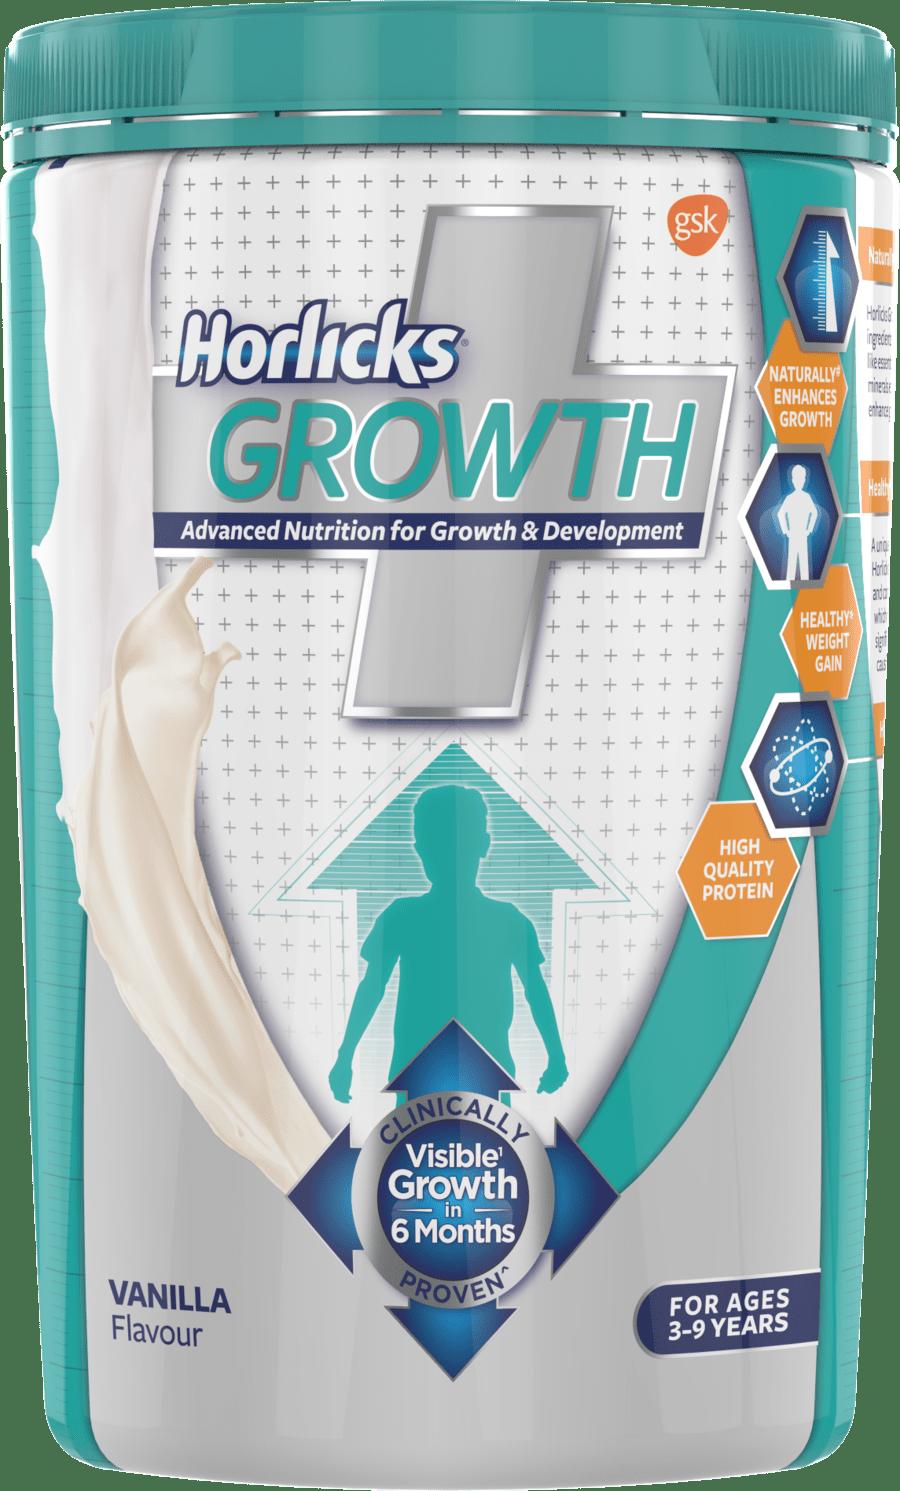 Horlicks Growth Plus – Health & Nutrition Drink (vanilla Flavor) 400gm Pet Jar